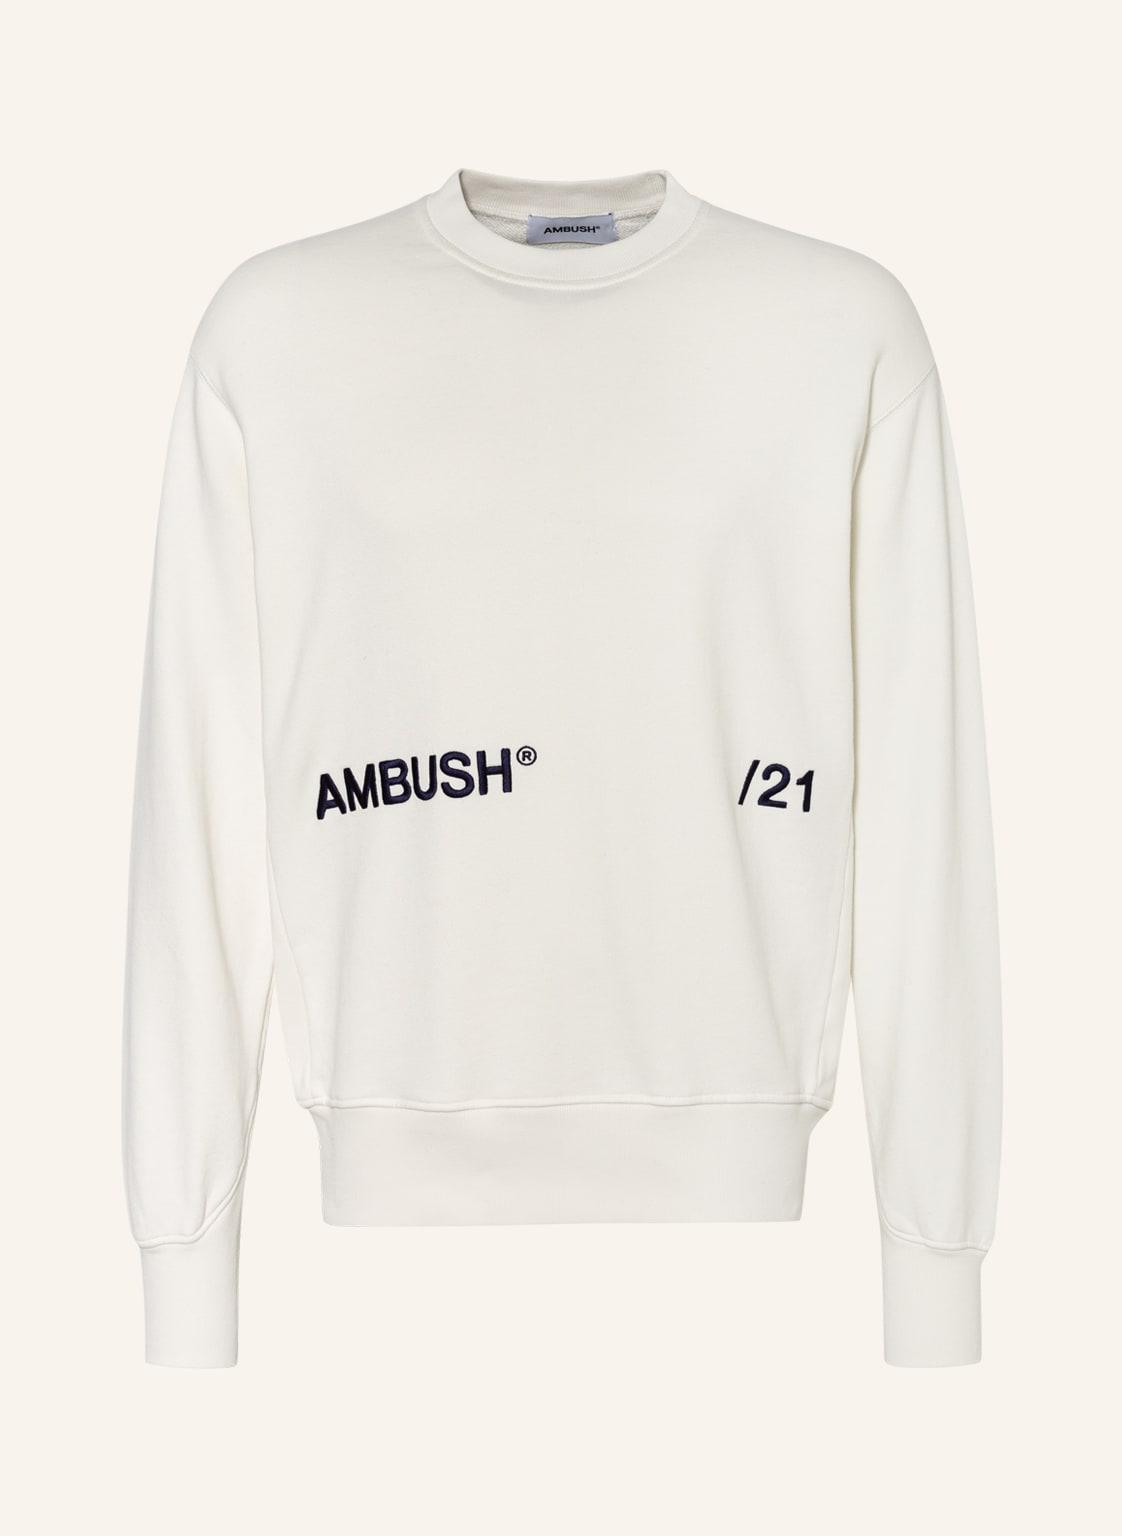 Image of Ambush Sweatshirt weiss